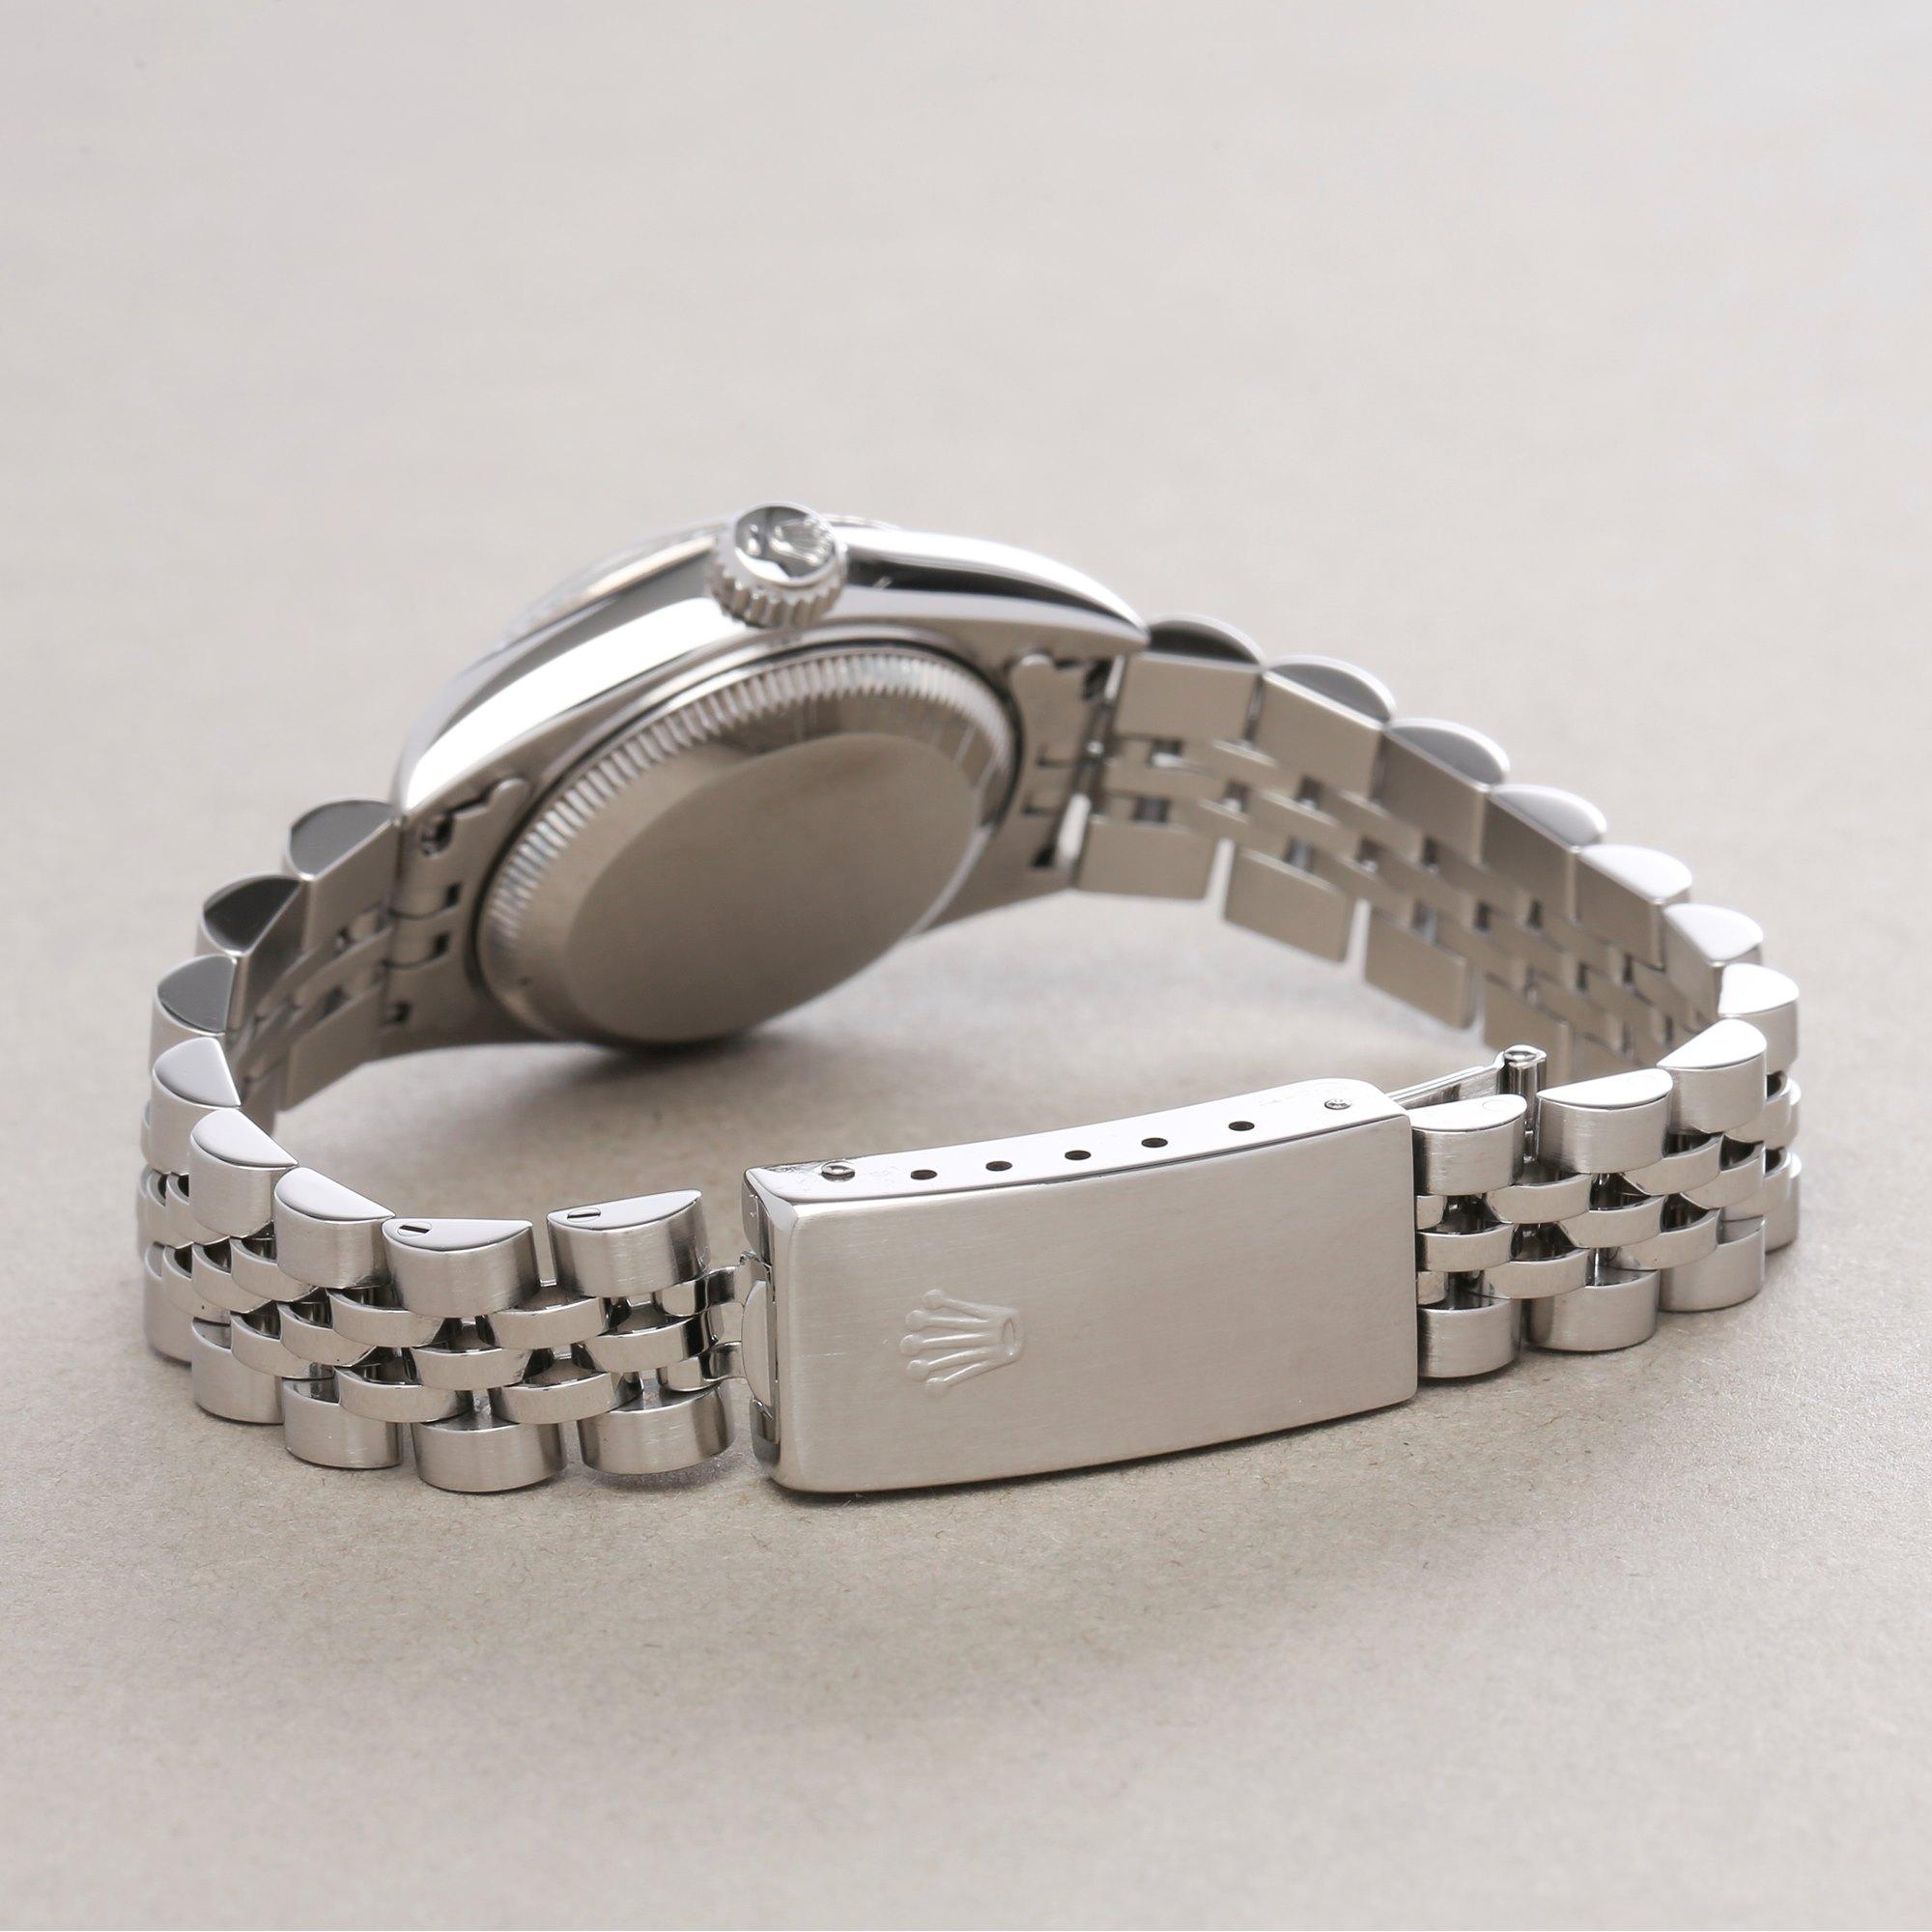 Rolex Datejust 26 Diamond Roestvrij Staal 69174G